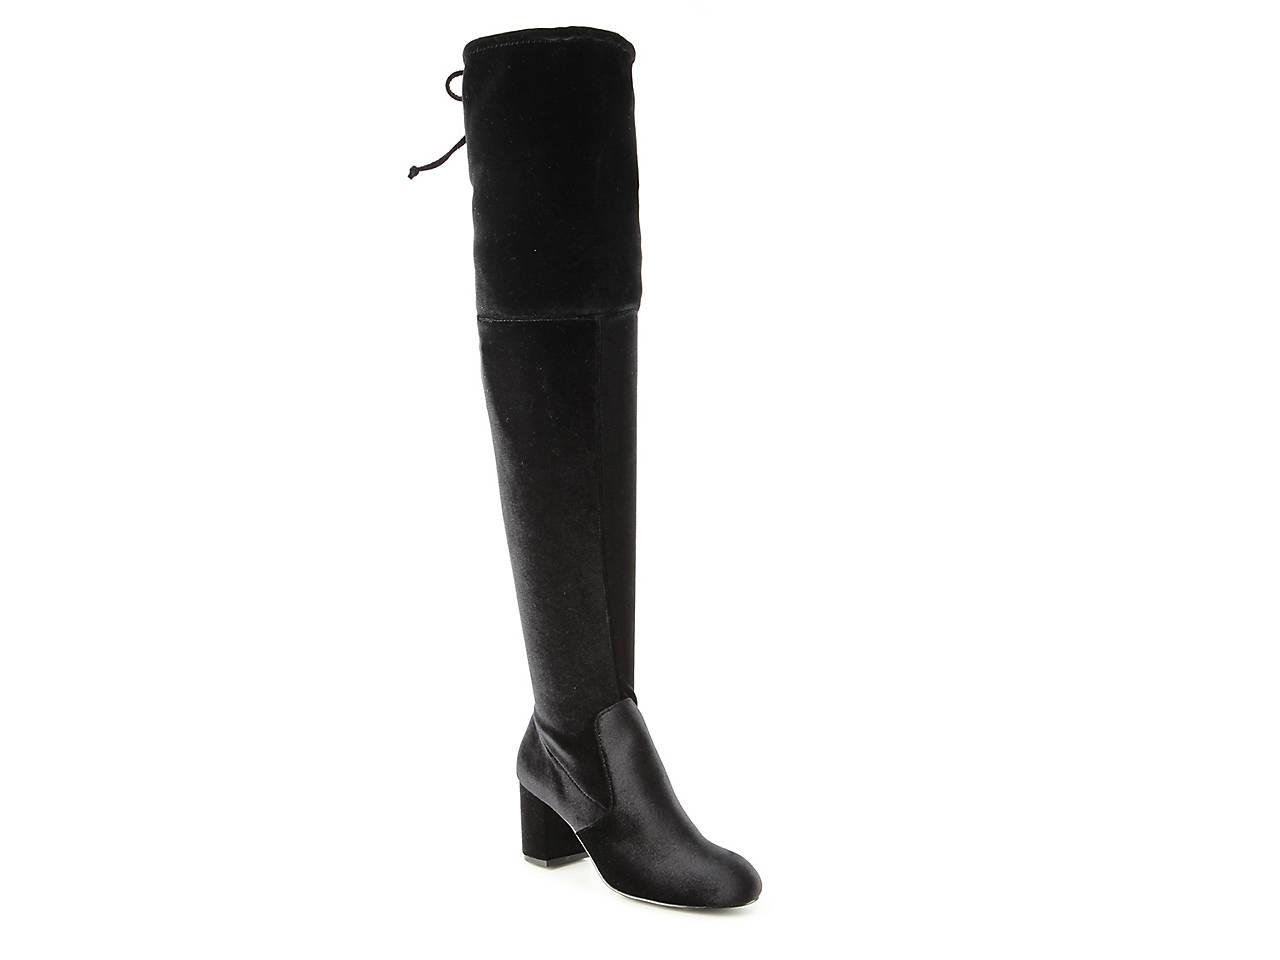 c262ccab27c14 Charles by Charles David Owen Velvet Over The Knee Boot Women s ...